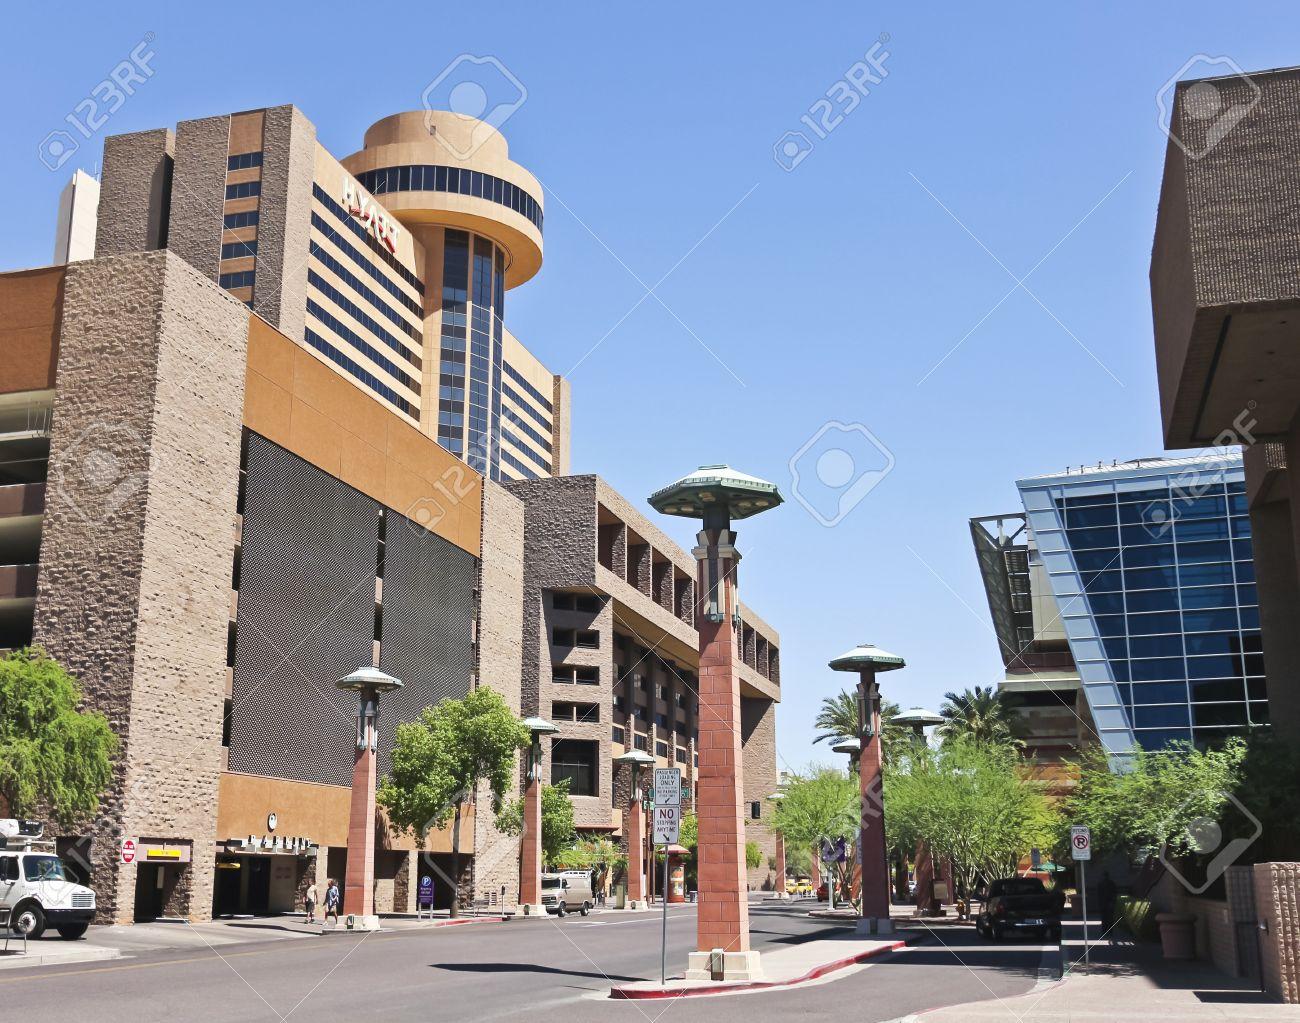 Phoenix, Arizona - June 13: Hyatt Regency Phoenix on June 13, 2012, in Phoenix, Arizona. Hyatt Regency Phoenix is a convention center for the City of Phoenix, Arizona, United States. Stock Photo - 16284722